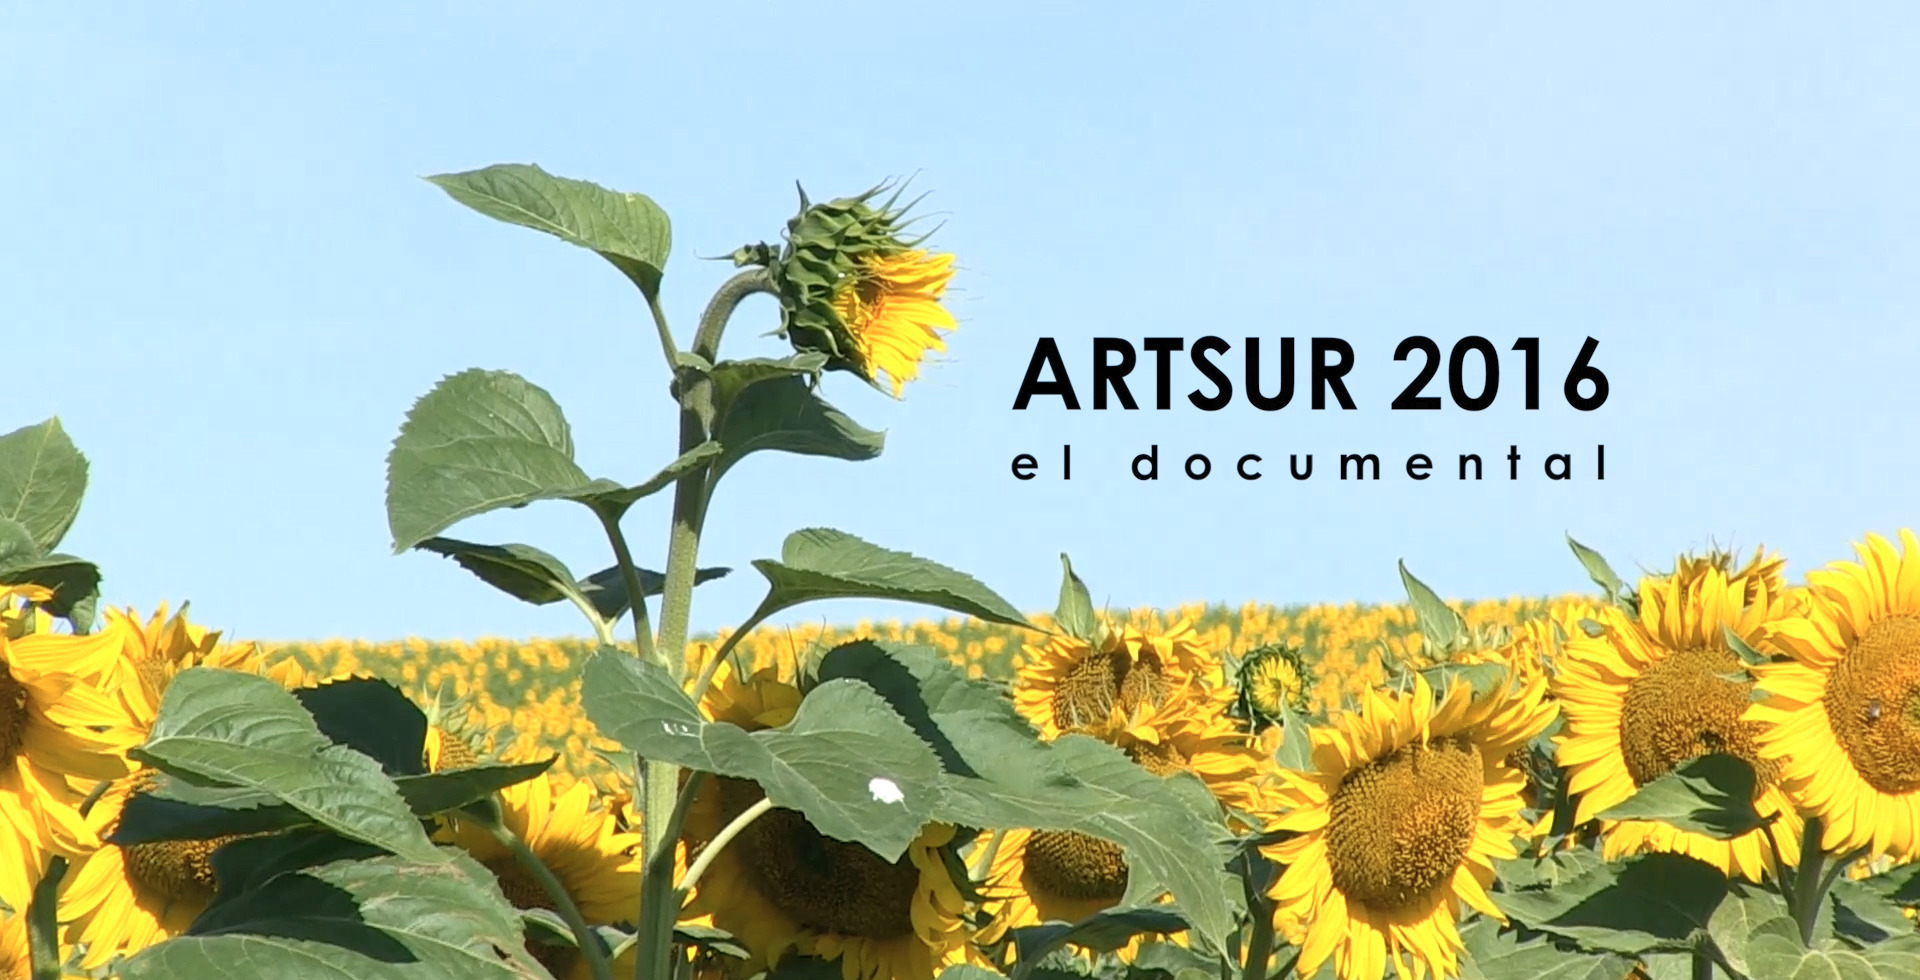 header image of documentary Artsur'16